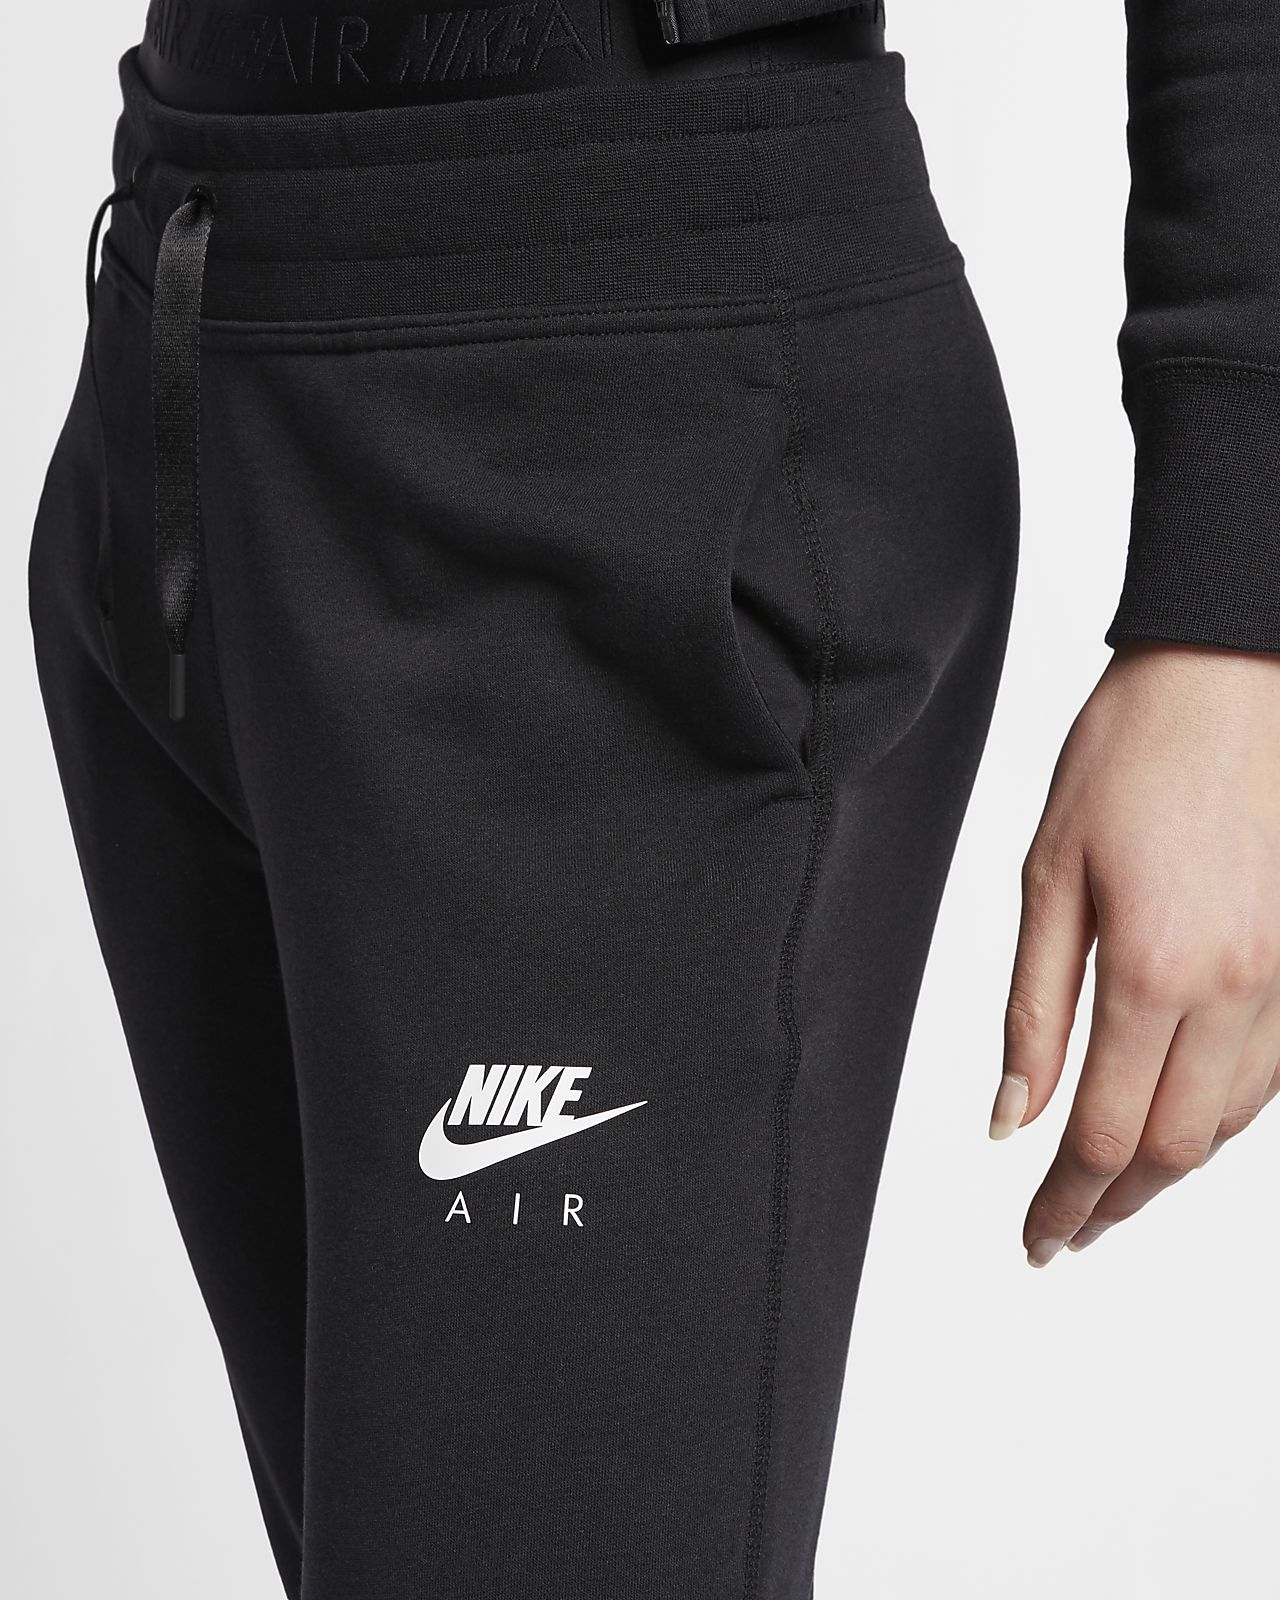 493ed25b242b27 Nike Air Women s Fleece Trousers. Nike.com ID